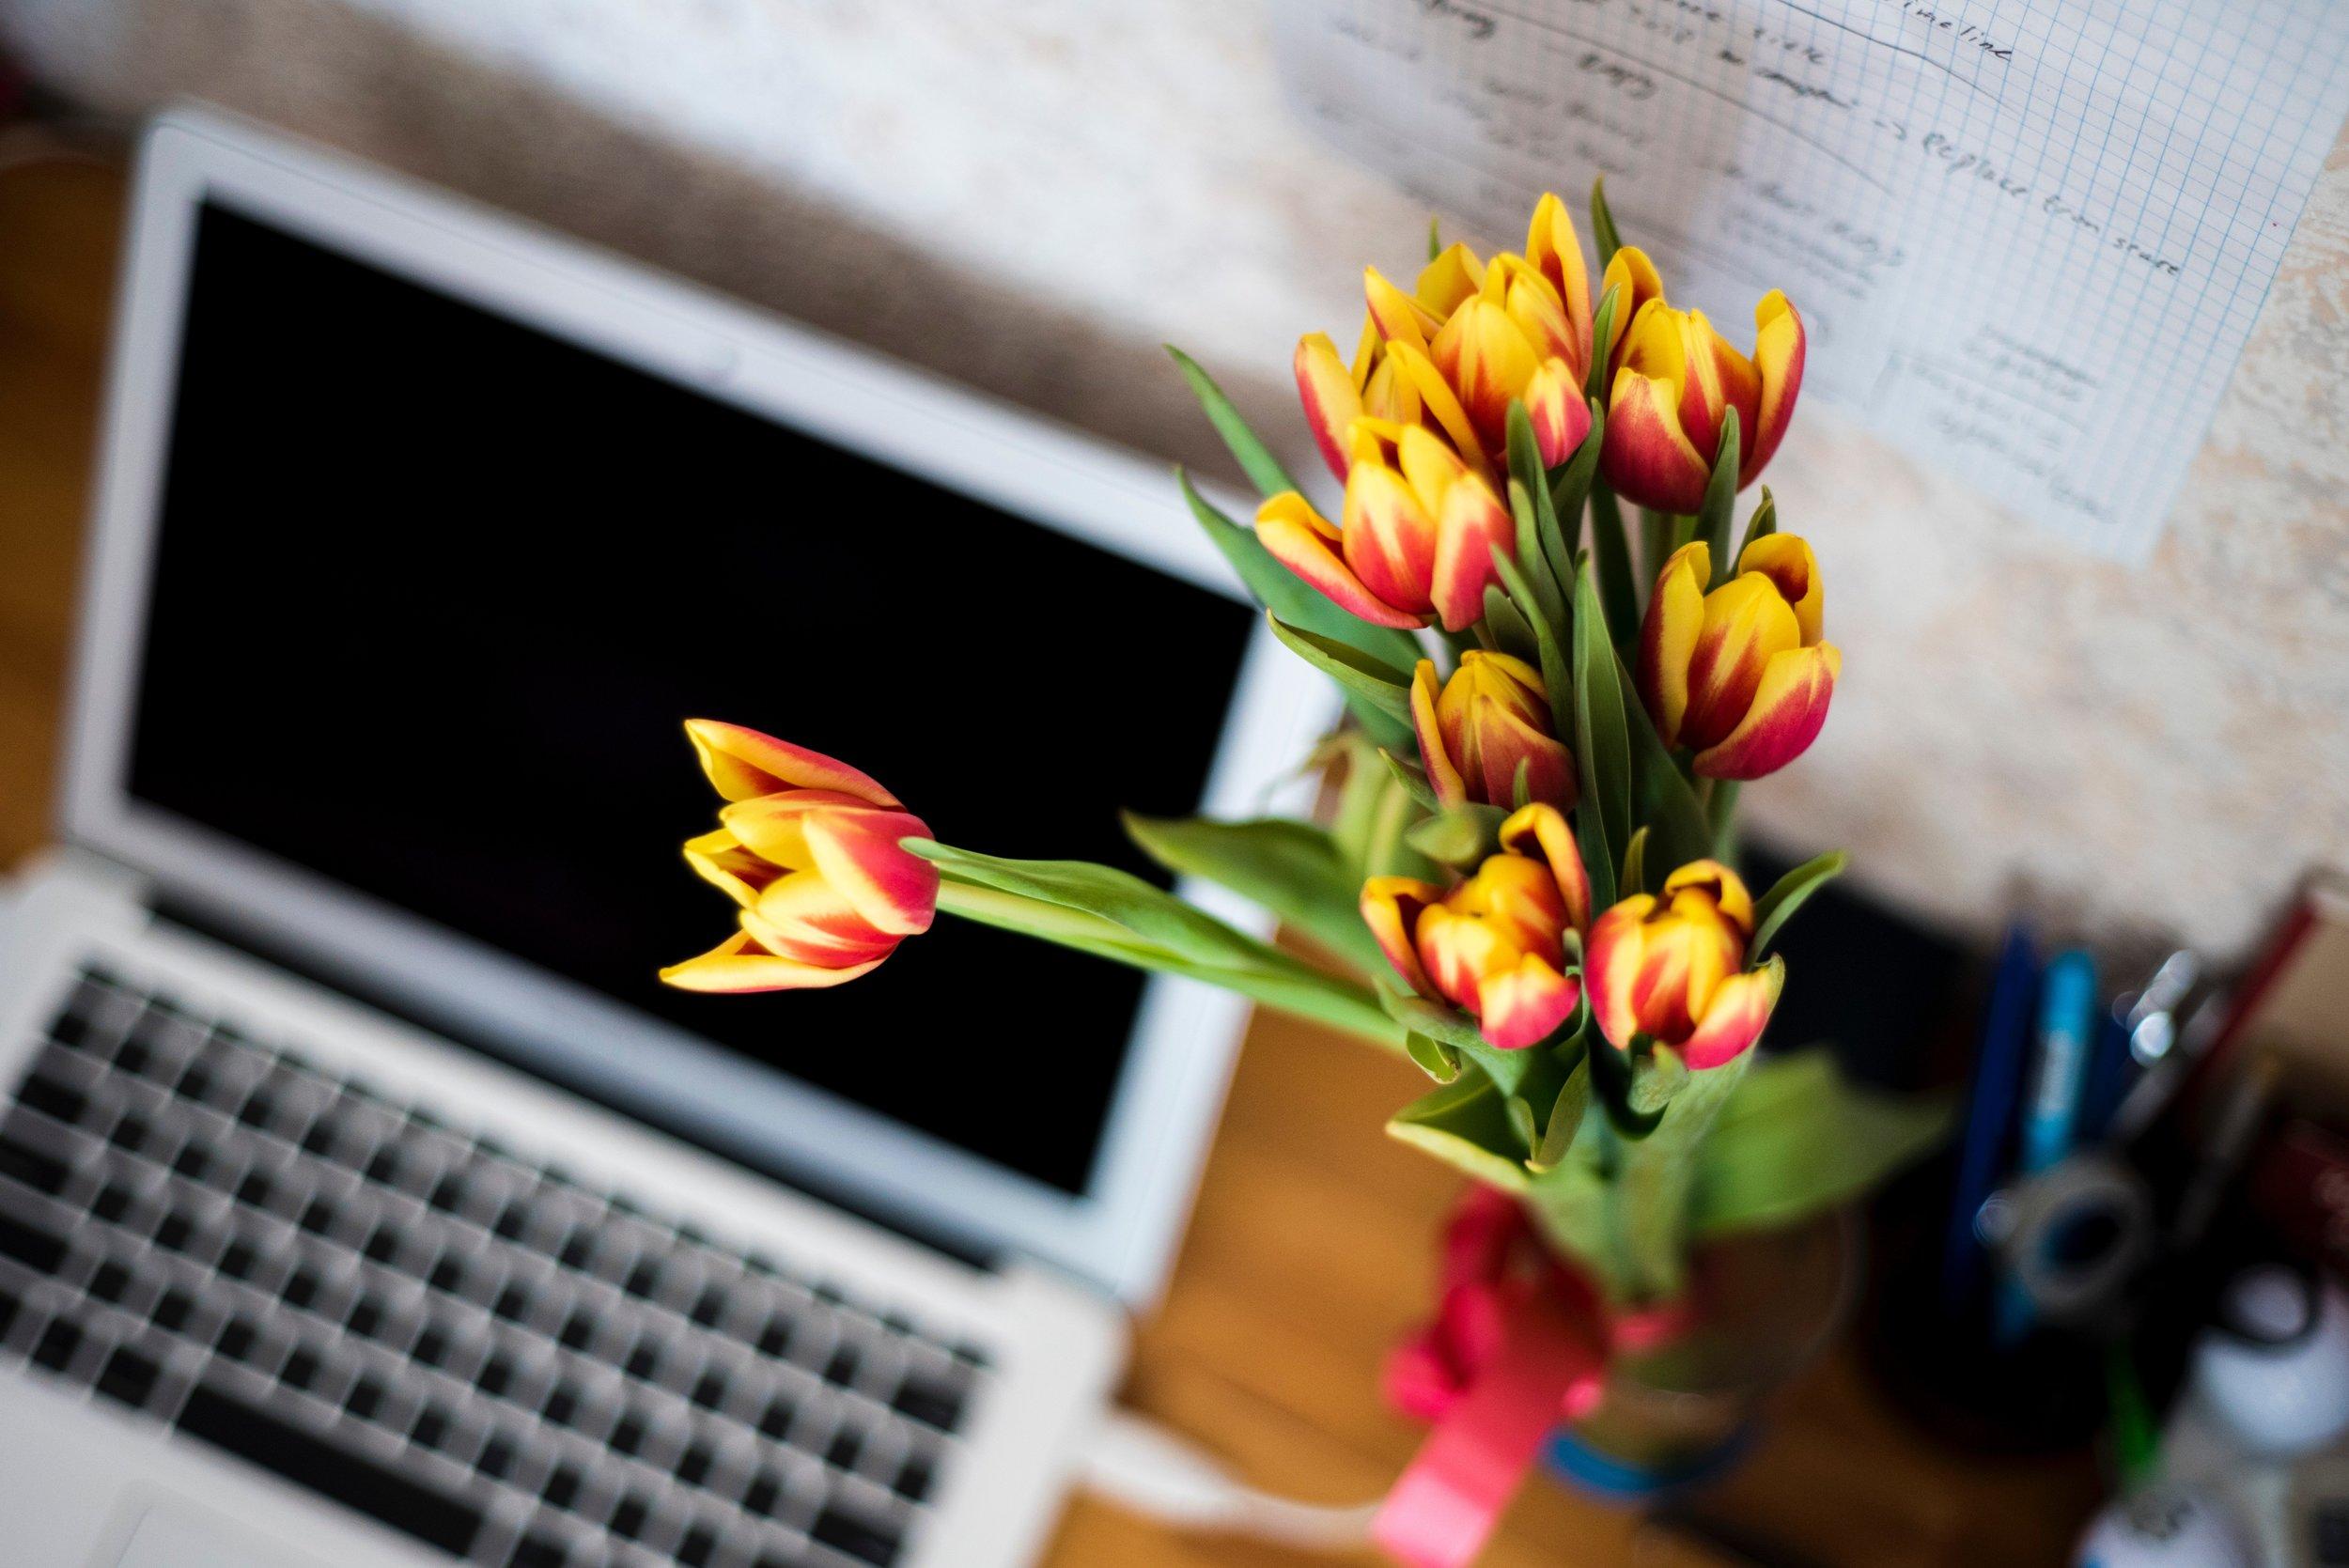 mac and tulips.jpg